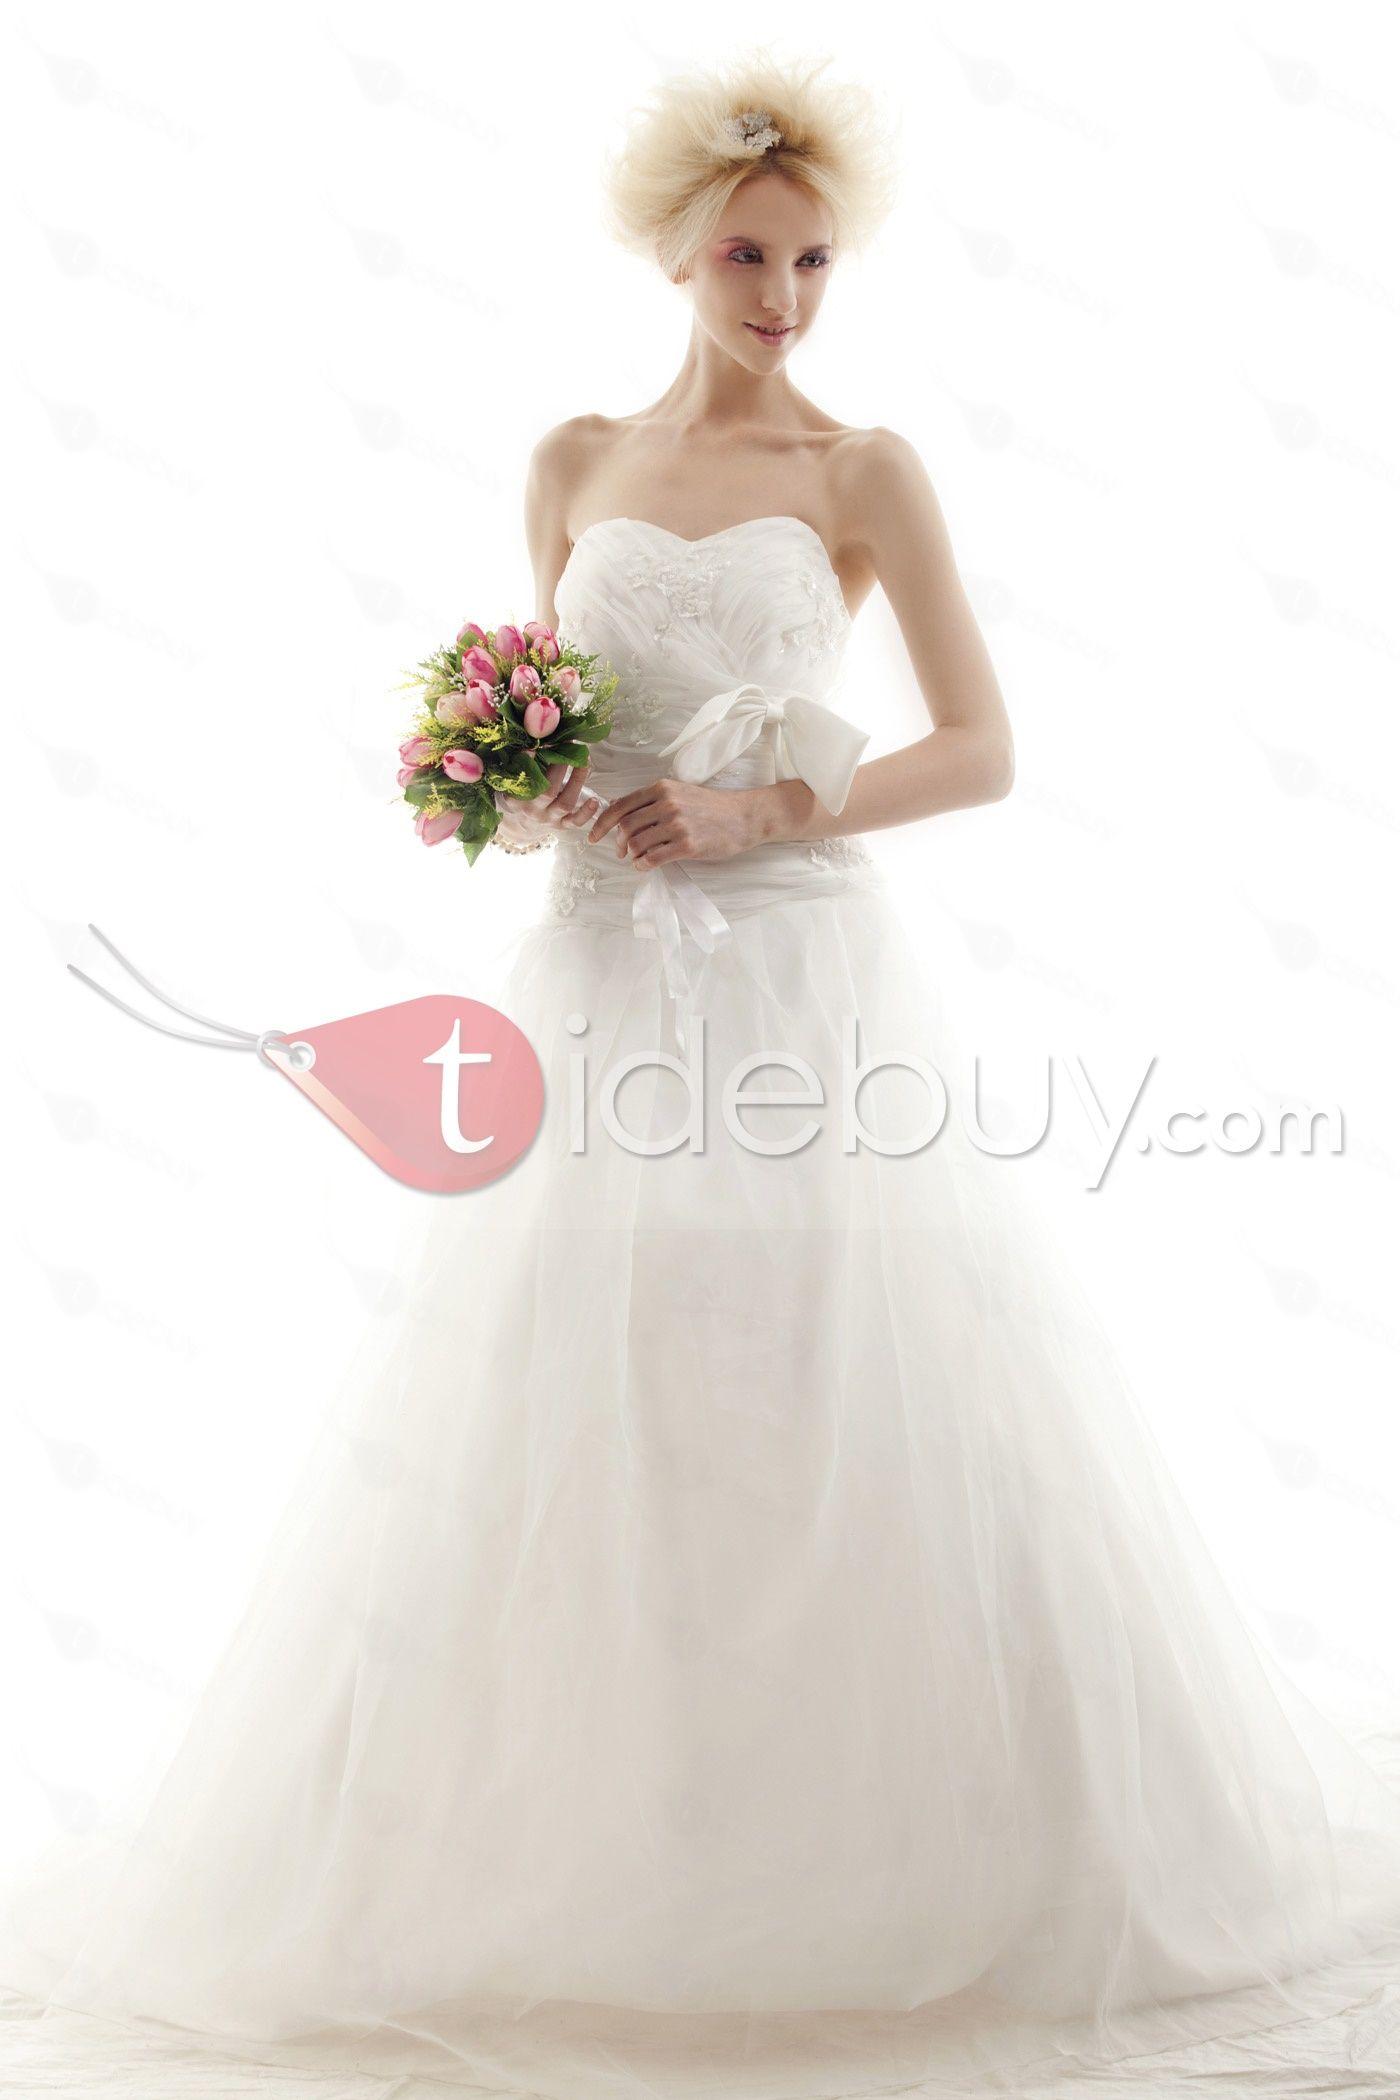 Amazing Ball Gown Sweetheart Chapel Nastye's Wedding Dress for Brides : Tidebuy.com     Beach wedding